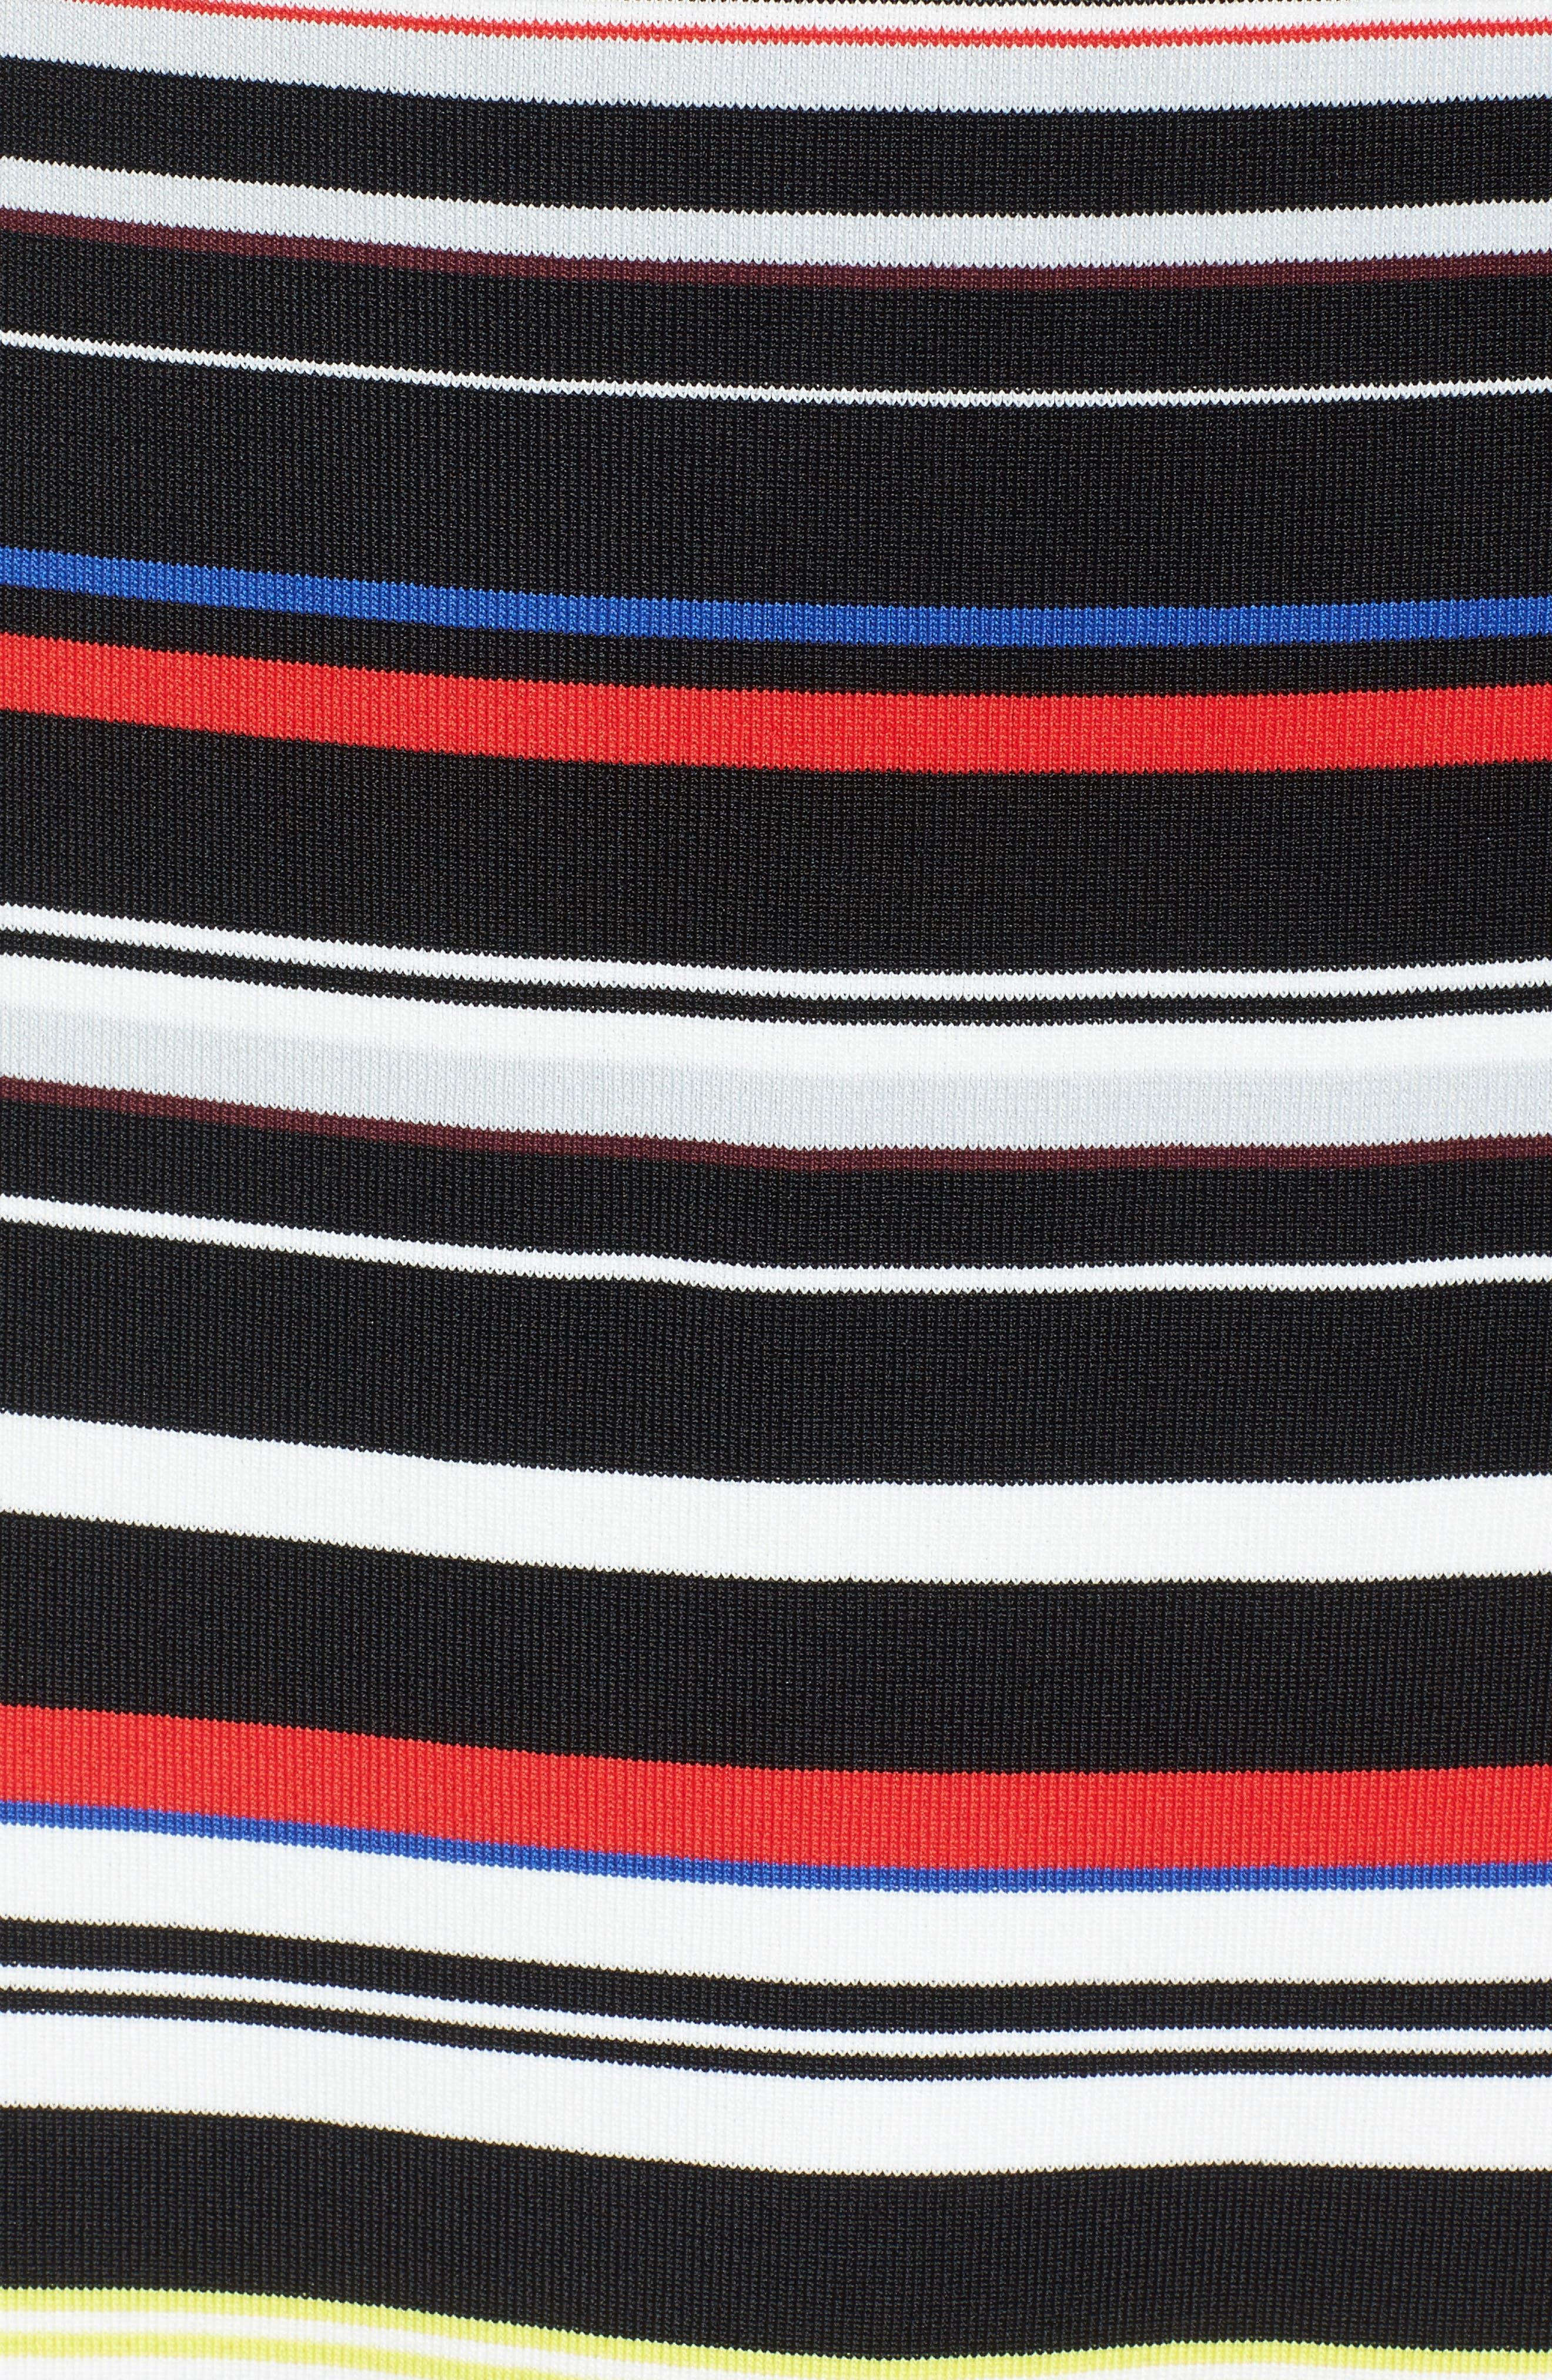 Sleeveless Mock Neck Knit Dress,                             Alternate thumbnail 30, color,